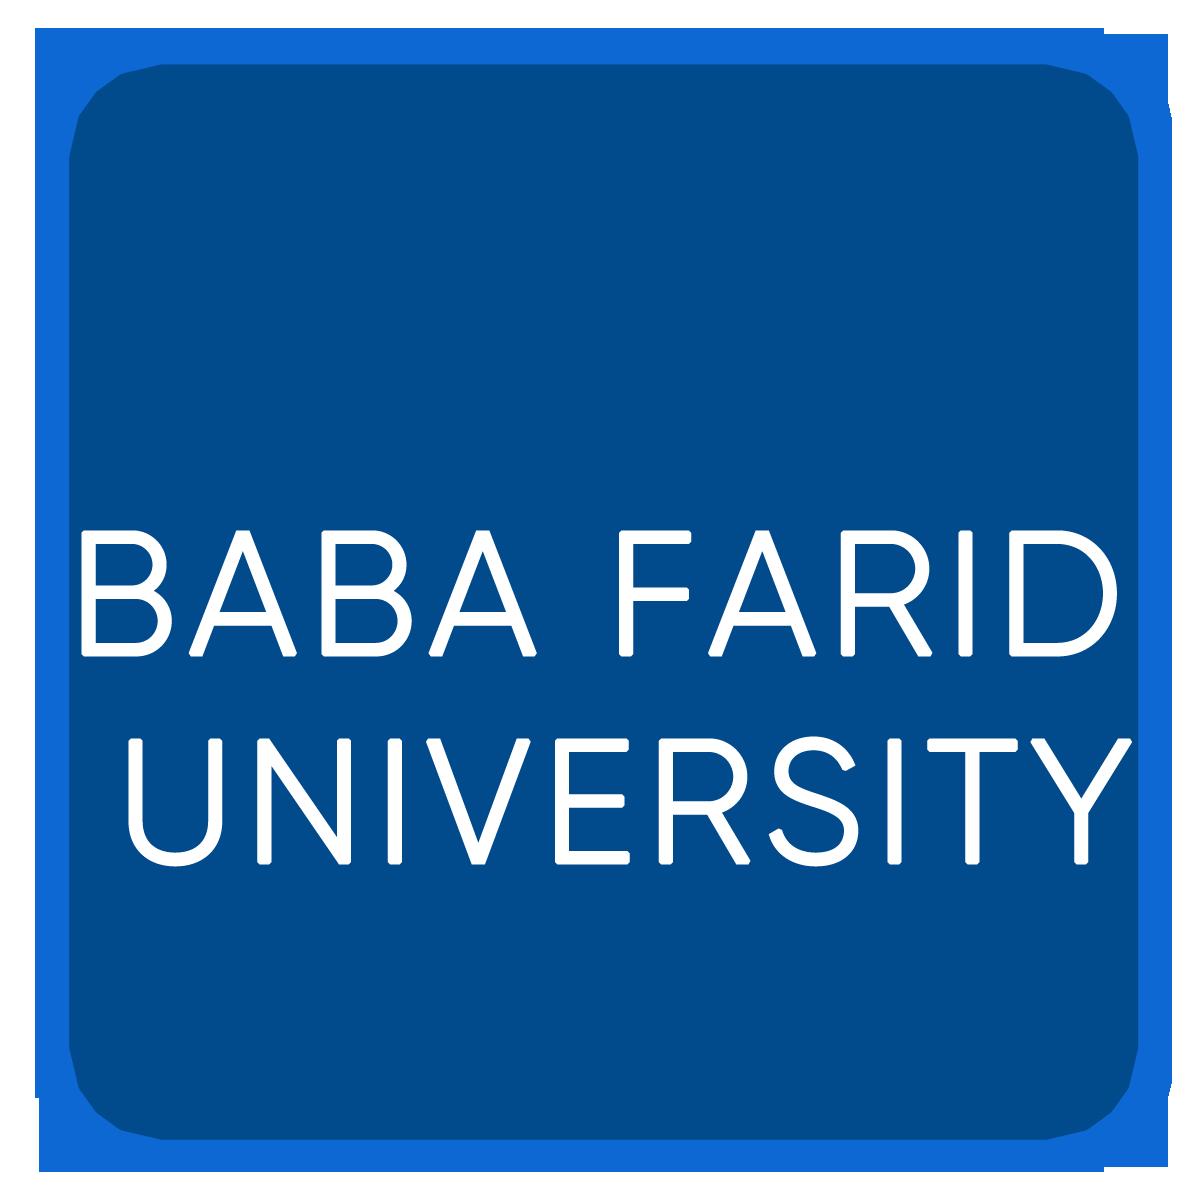 BABA FARID UNIVERSITY